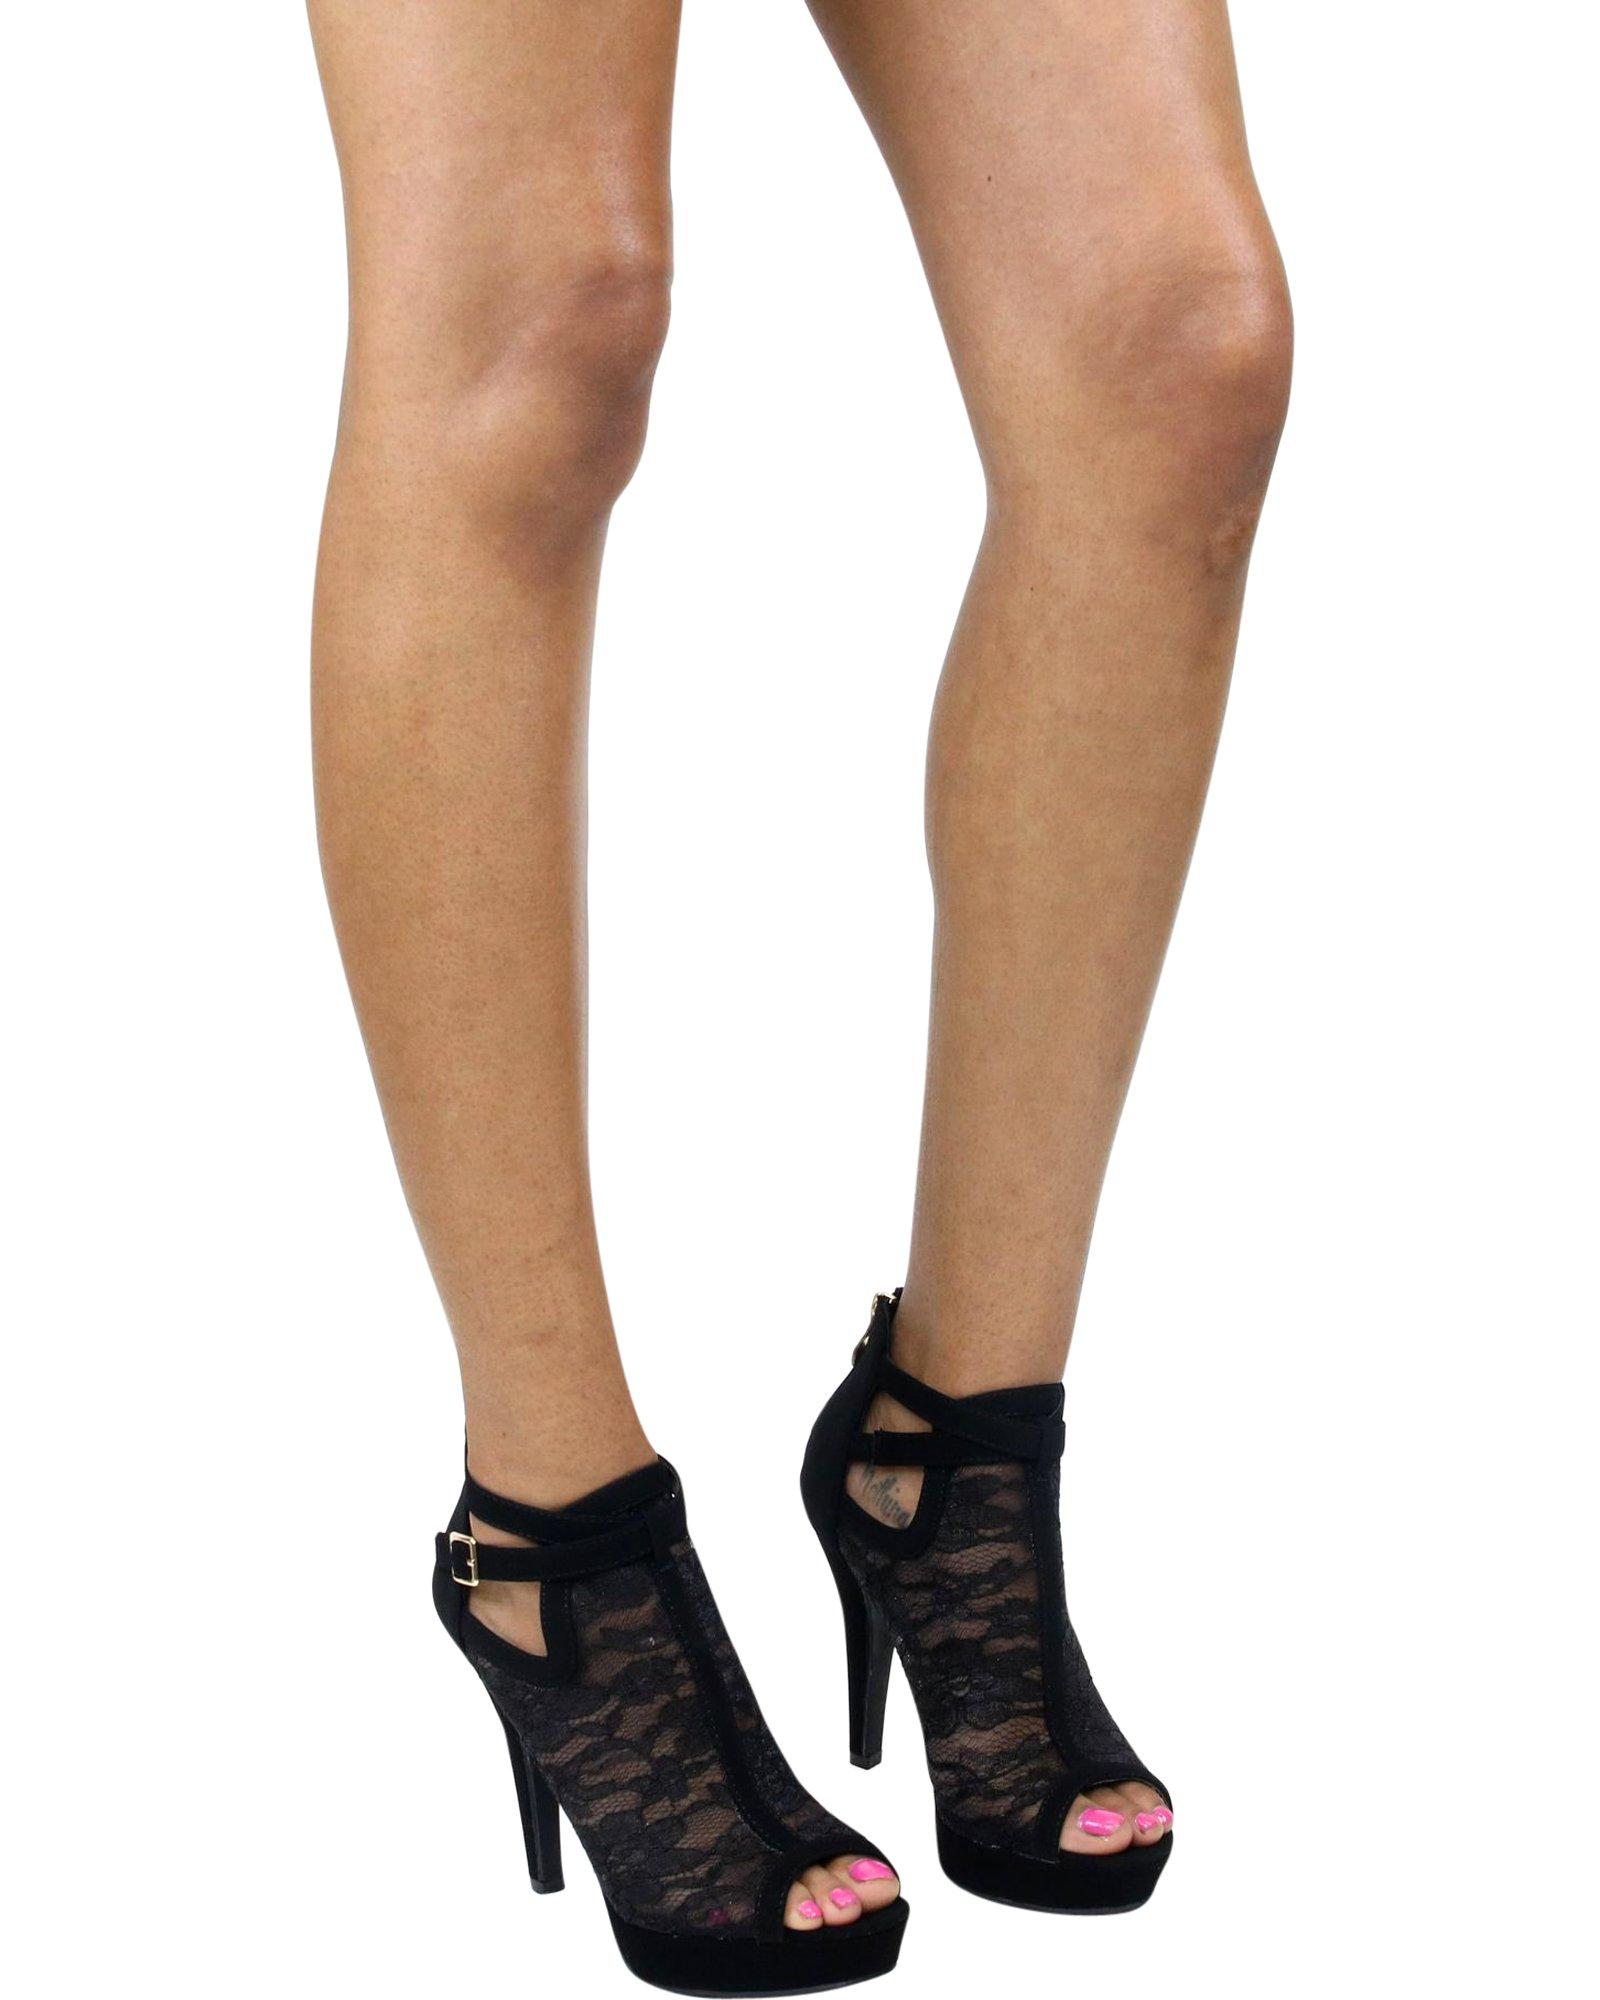 Top Moda Women's Khole Lacey Heel, Black,10 by Top Moda (Image #2)